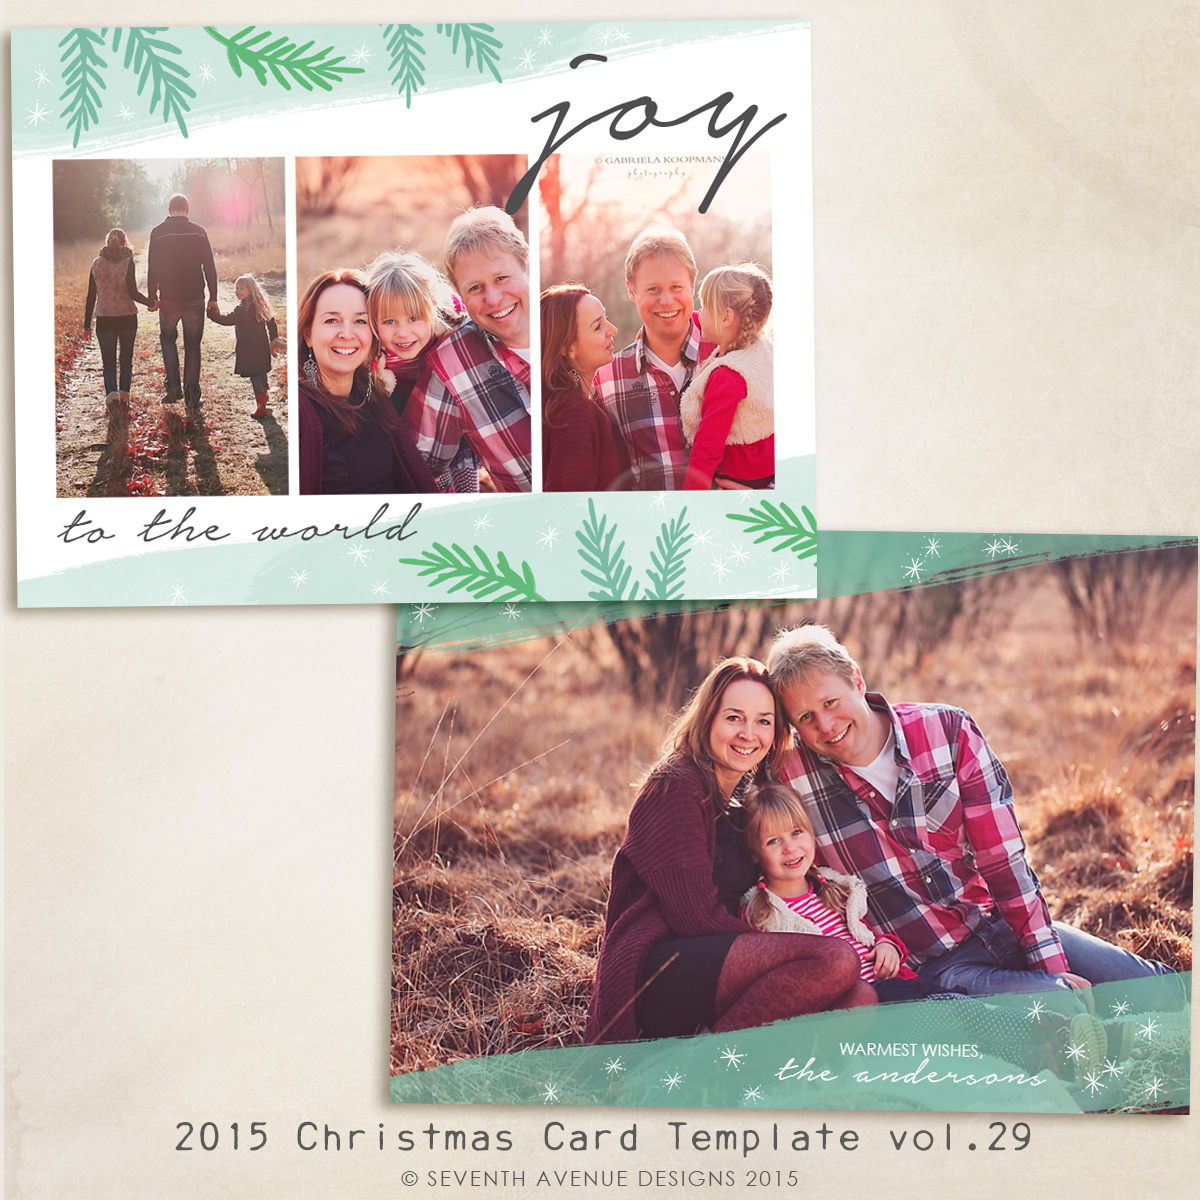 Christmas Card Templates Vol X Inch Card Template Cc - Christmas card templates for photographers 2